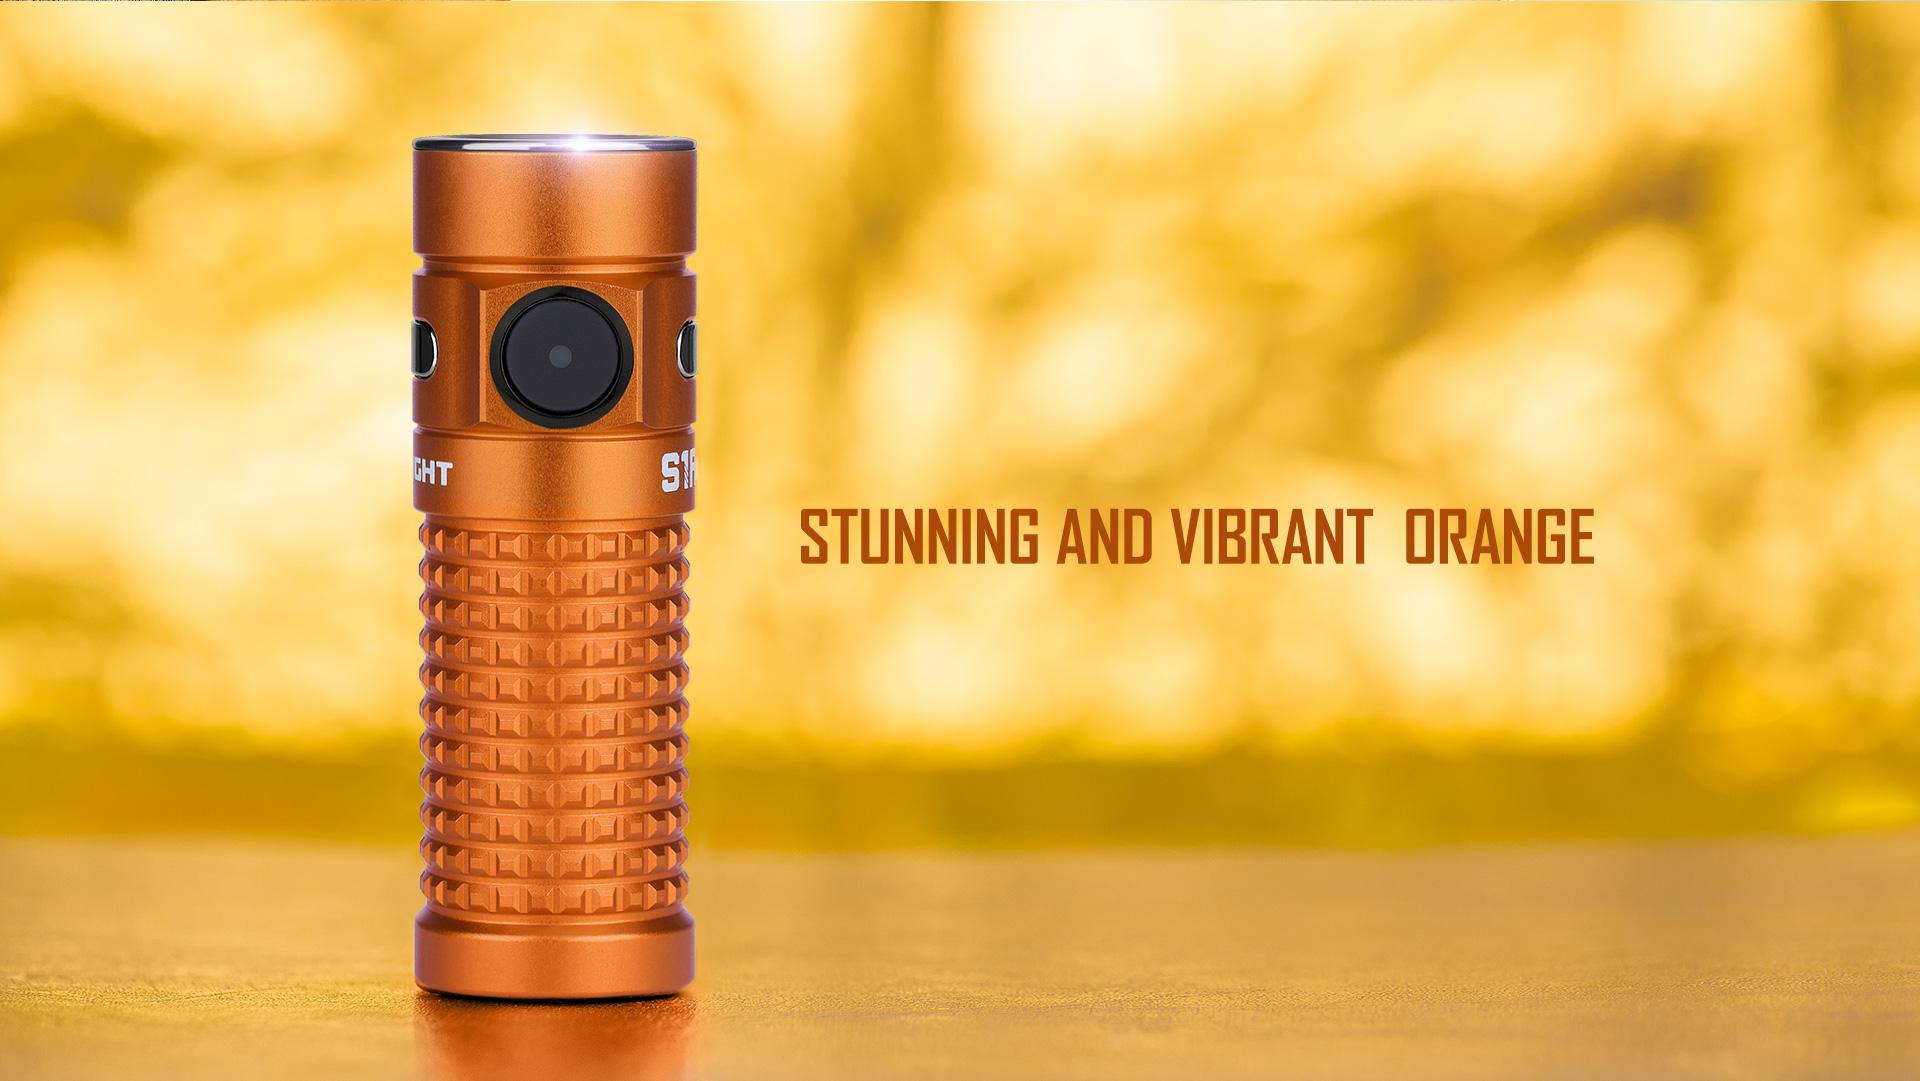 edc pocket flashlight S1R Baton II Orange